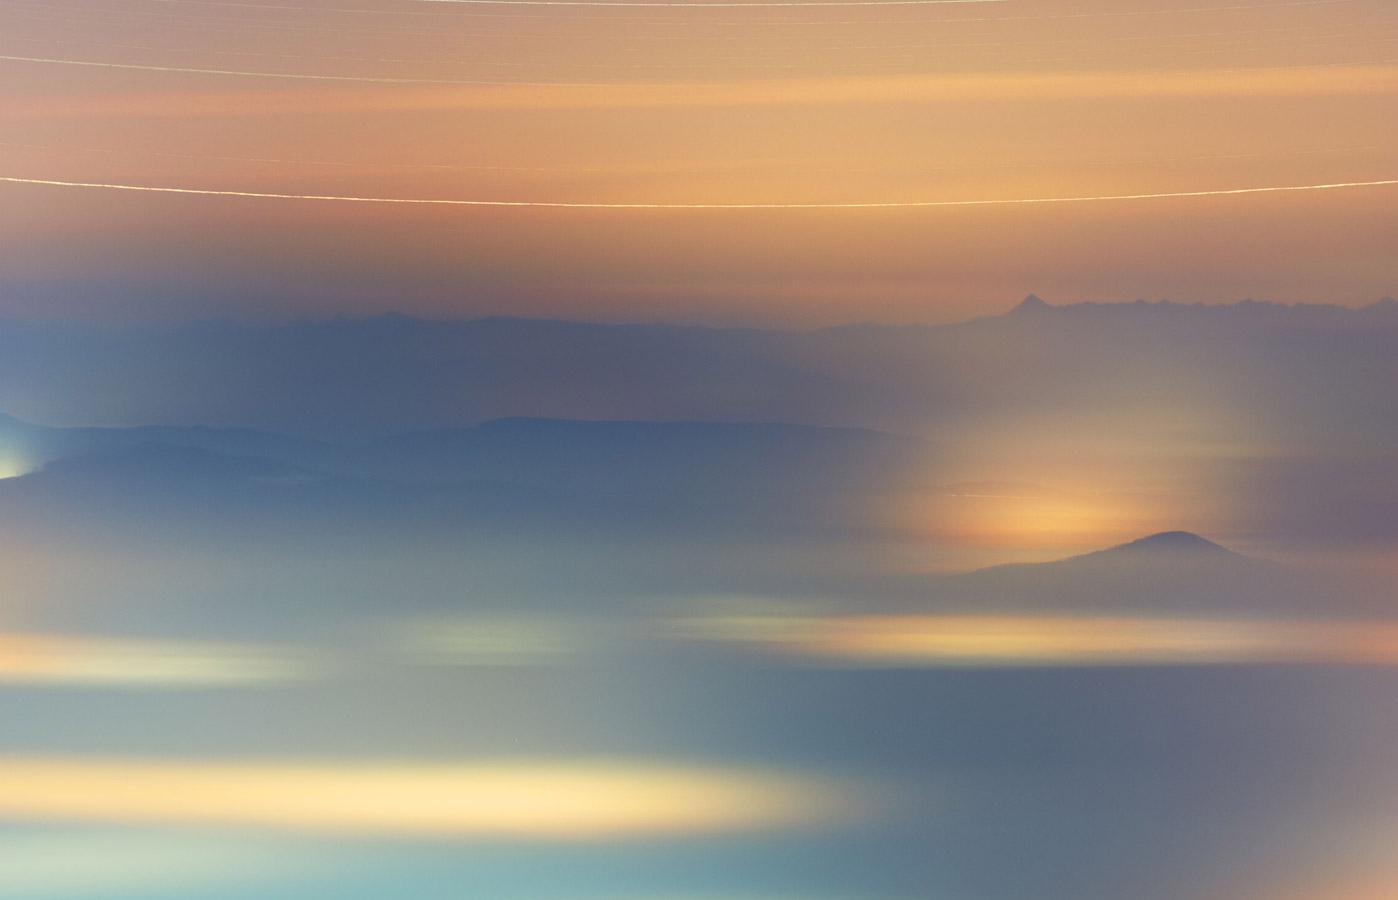 Приполярный, © Ференц Семар, Победитель категории «Картина неба», Конкурс астрофотографии Astronomy Photographer of the Year